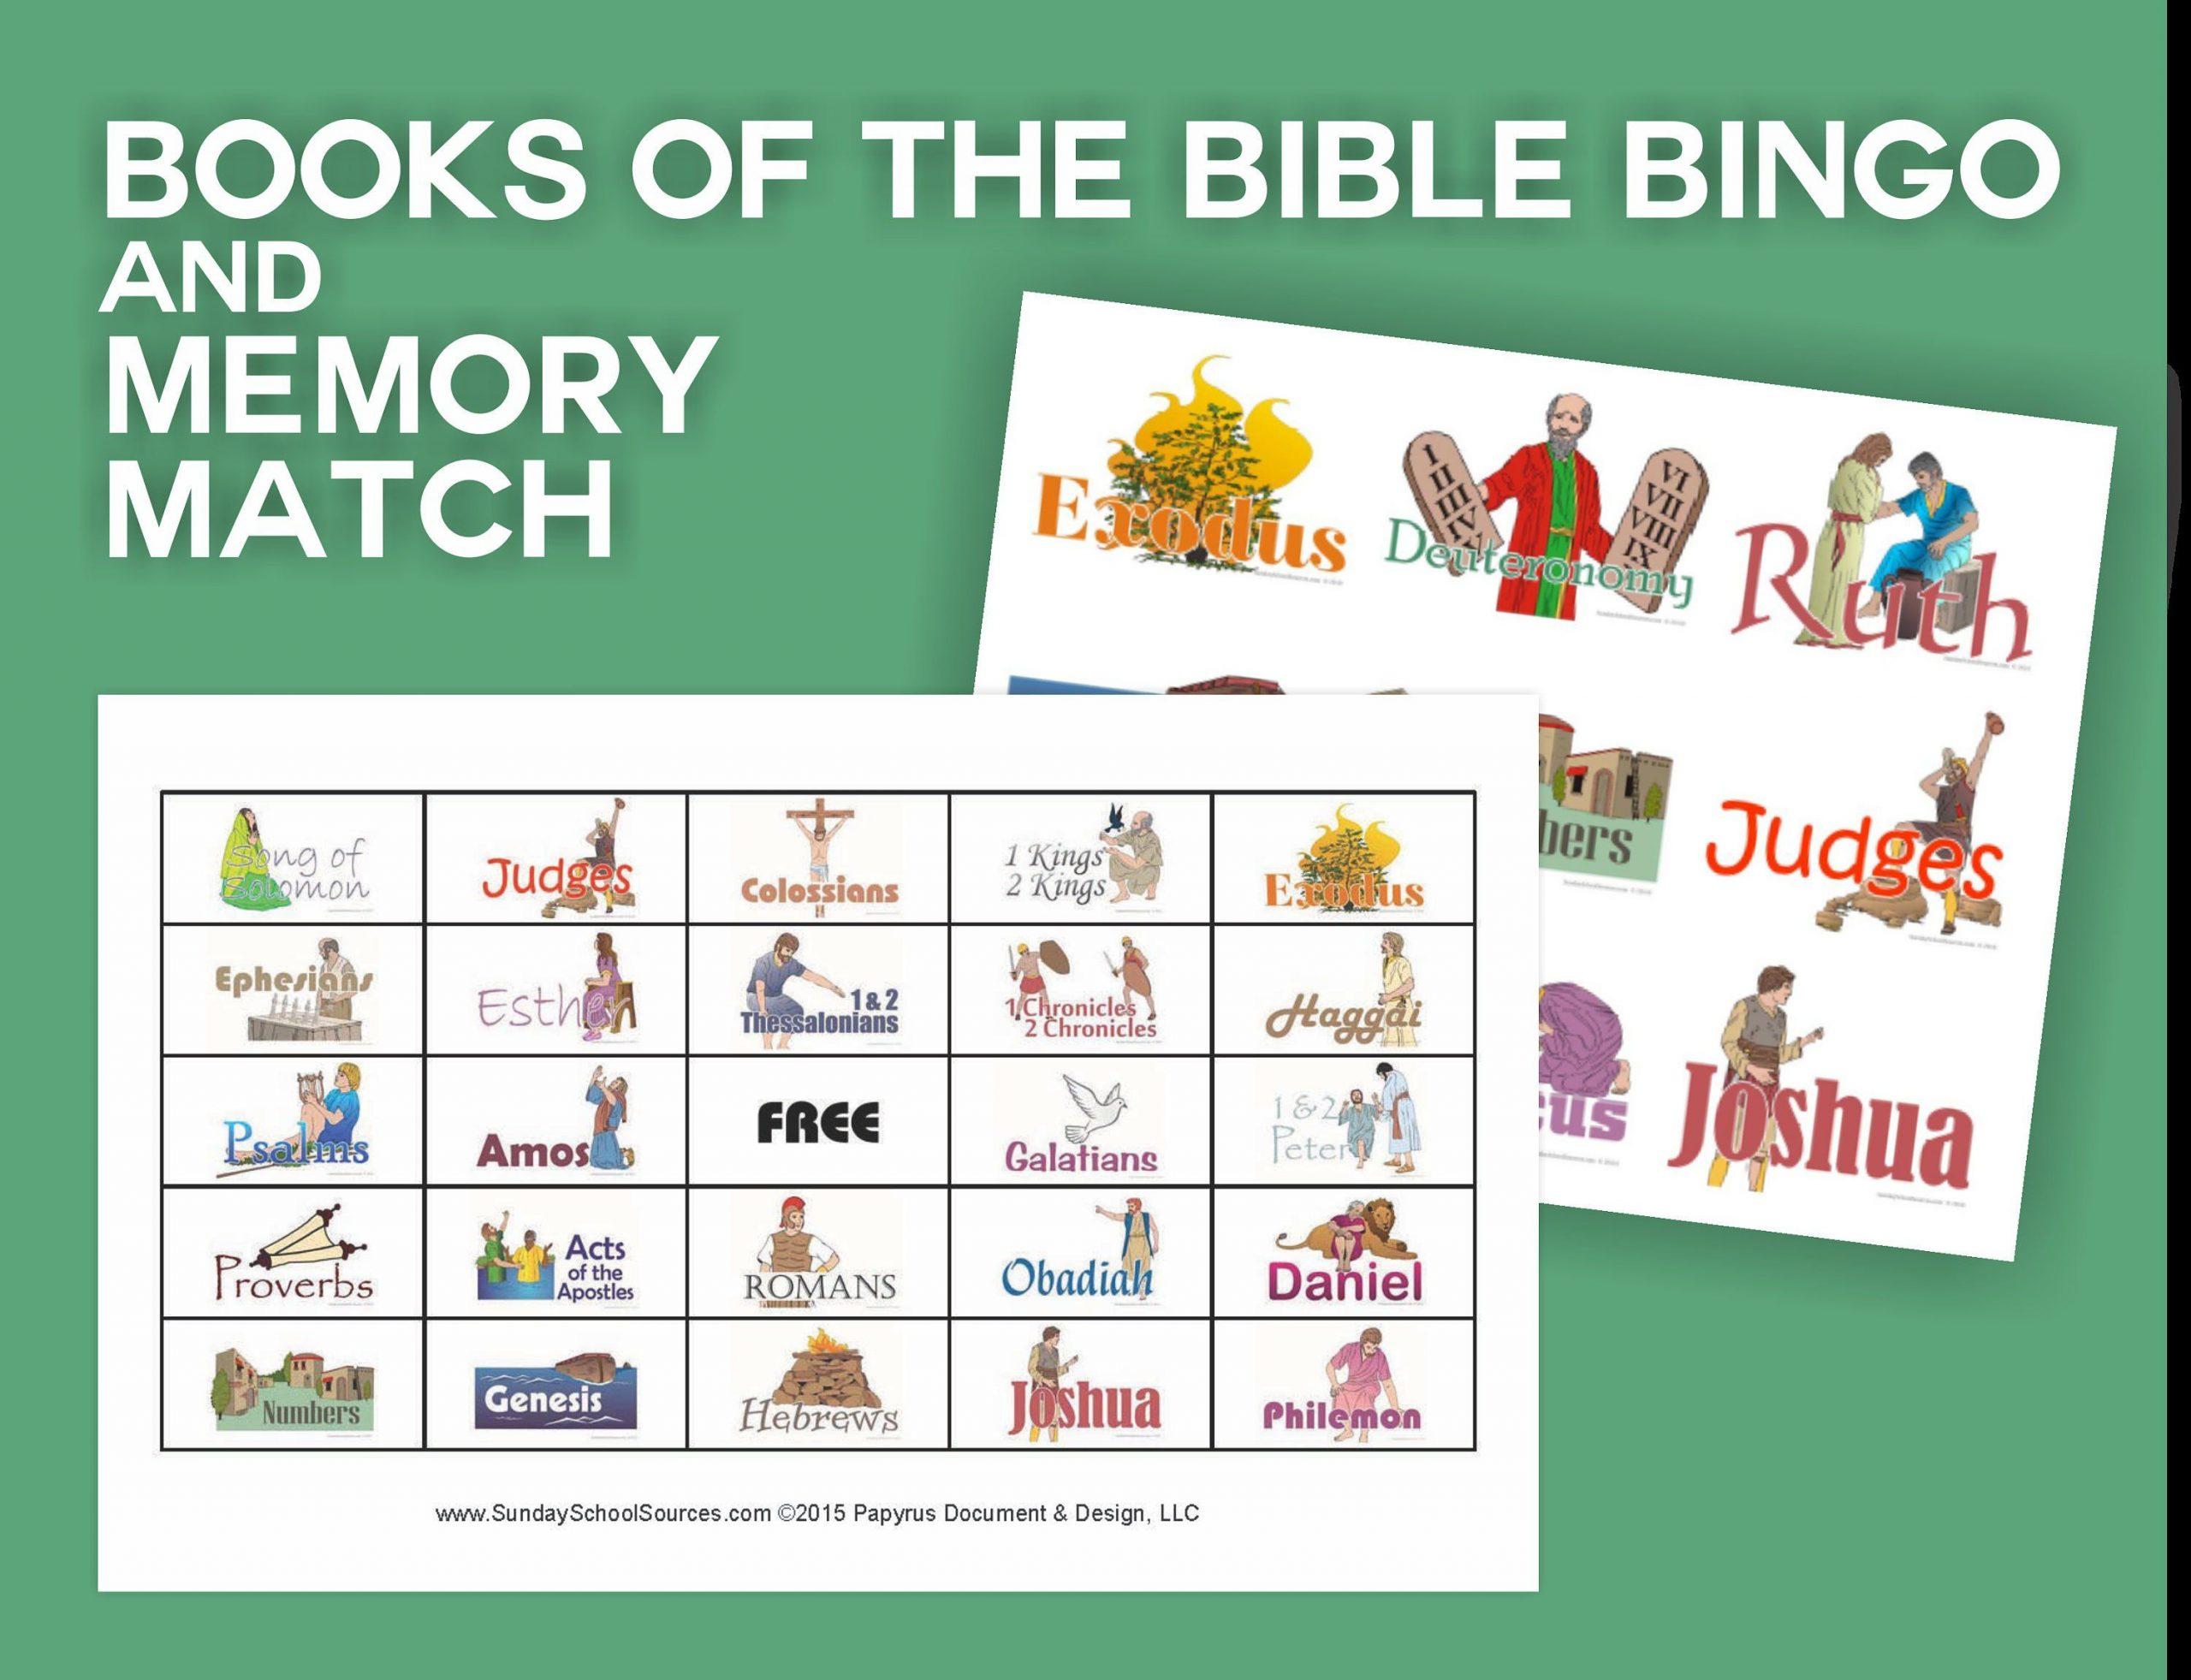 Books Of The Bible Bingo 48 Printable Cards & Memory Match